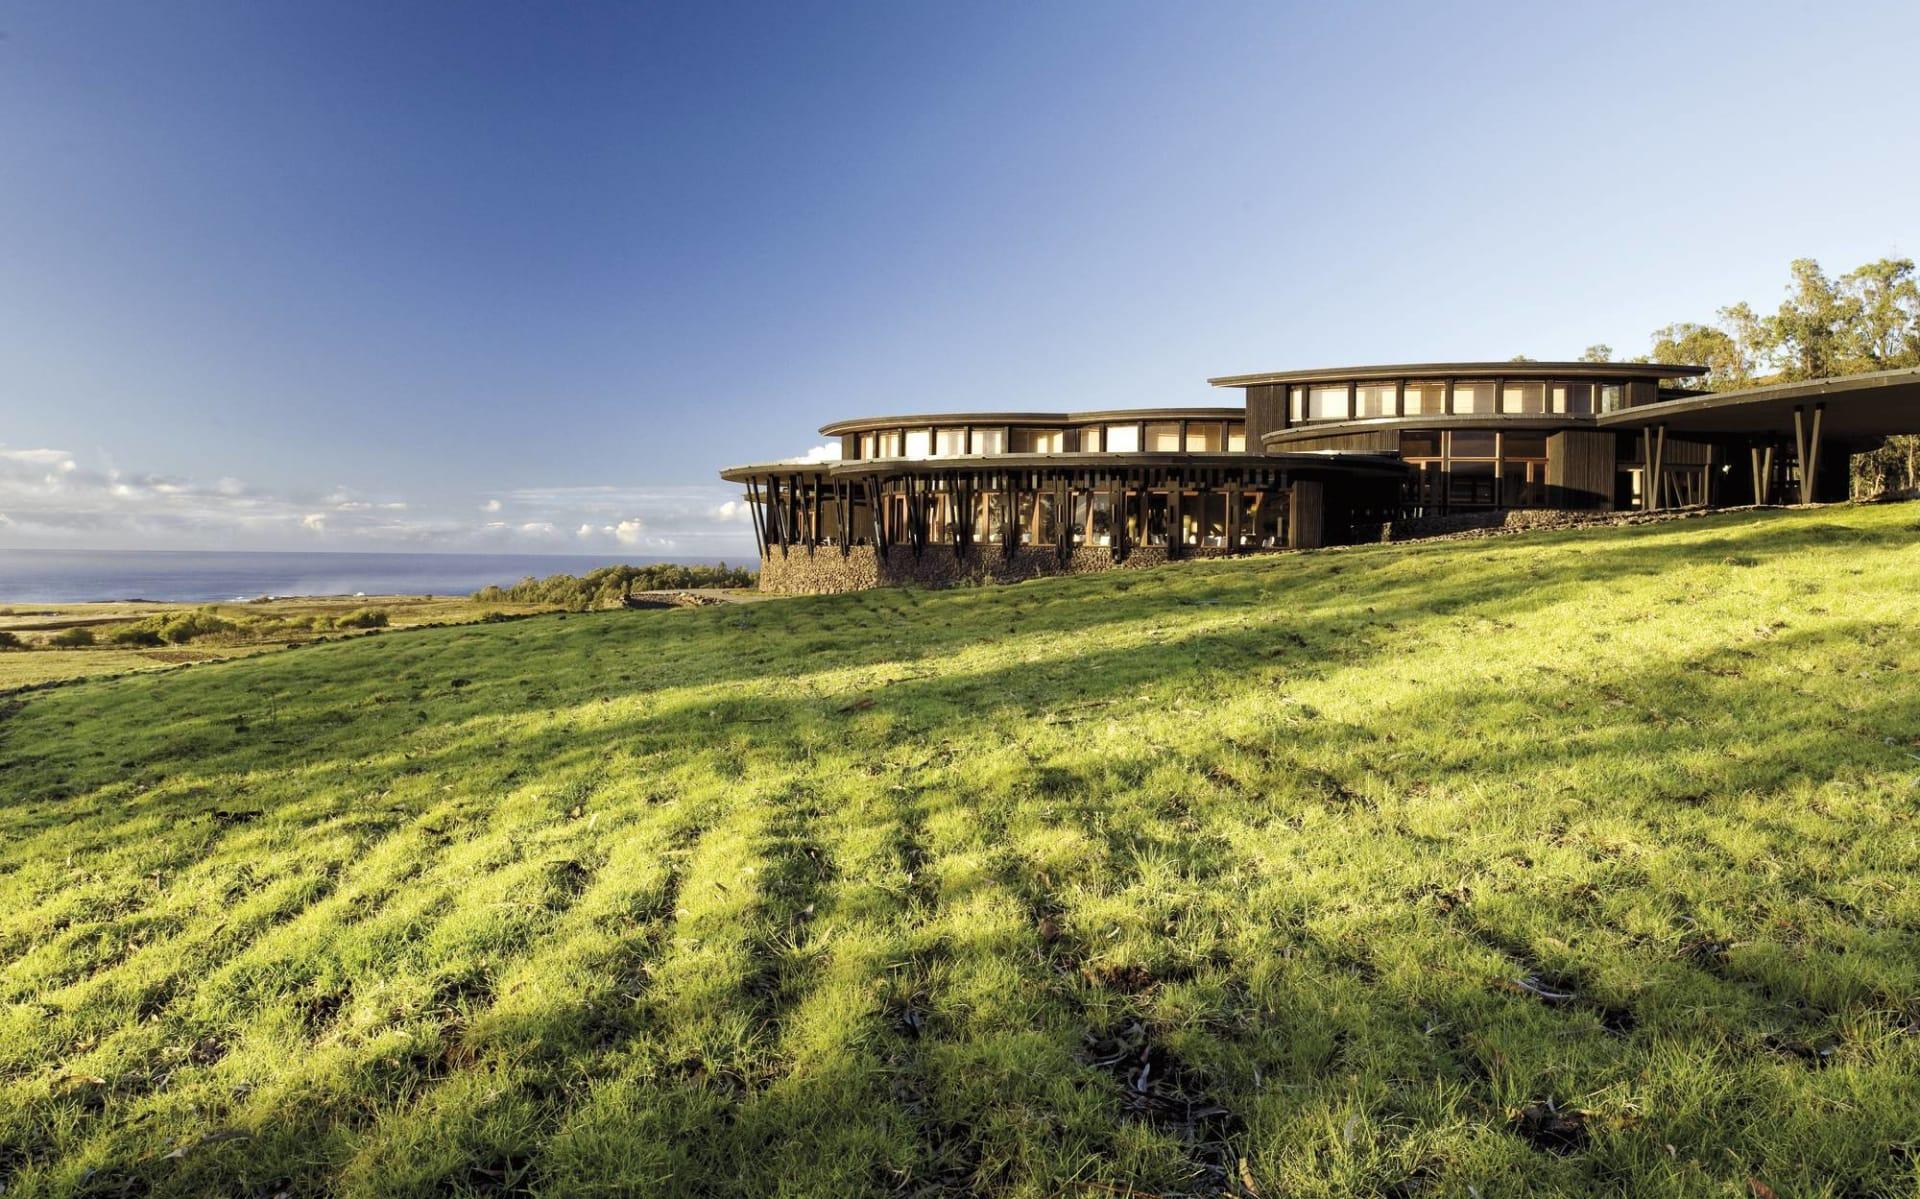 explora Rapa Nui ab Hanga Roa: exterior: Posada de Mike Rapu - Sicht auf das Hotel